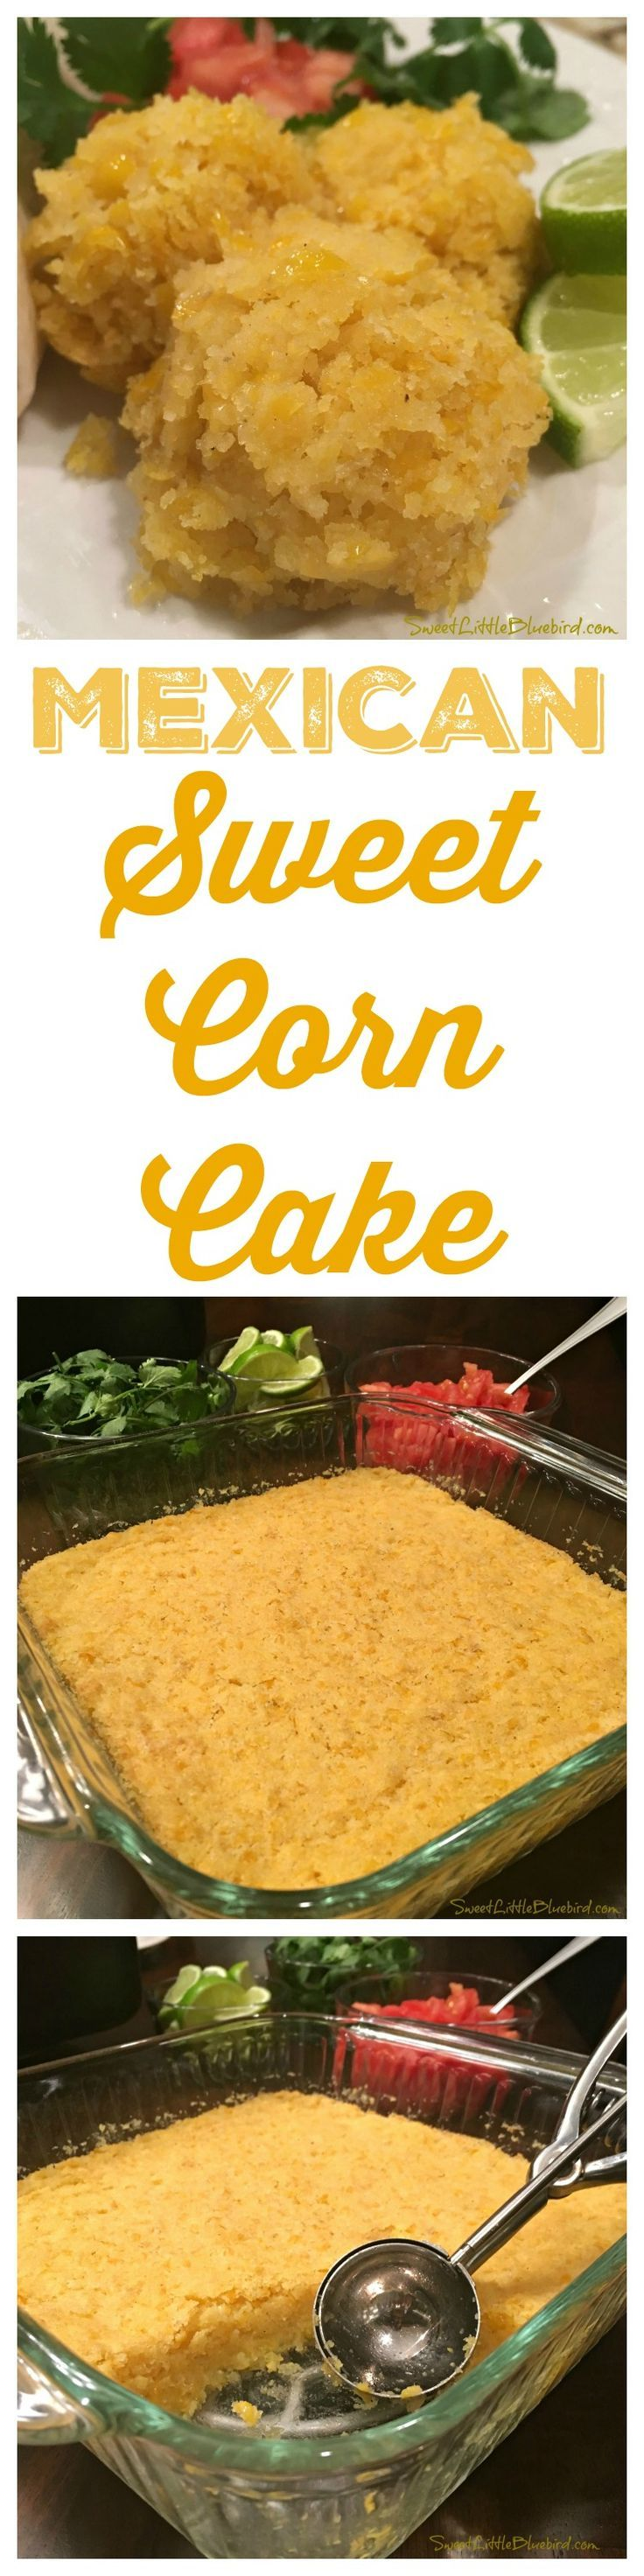 MEXICAN SWEET CORN CAKE -  The perfect side dish for any Mexican meal, Sweet Corn Cake! Just like the sweet corn side dish served at your favorite Mexican restaurants like Chi Chi's, Chevys Fresh Mex & El Torito!    SweetLittleBluebi...